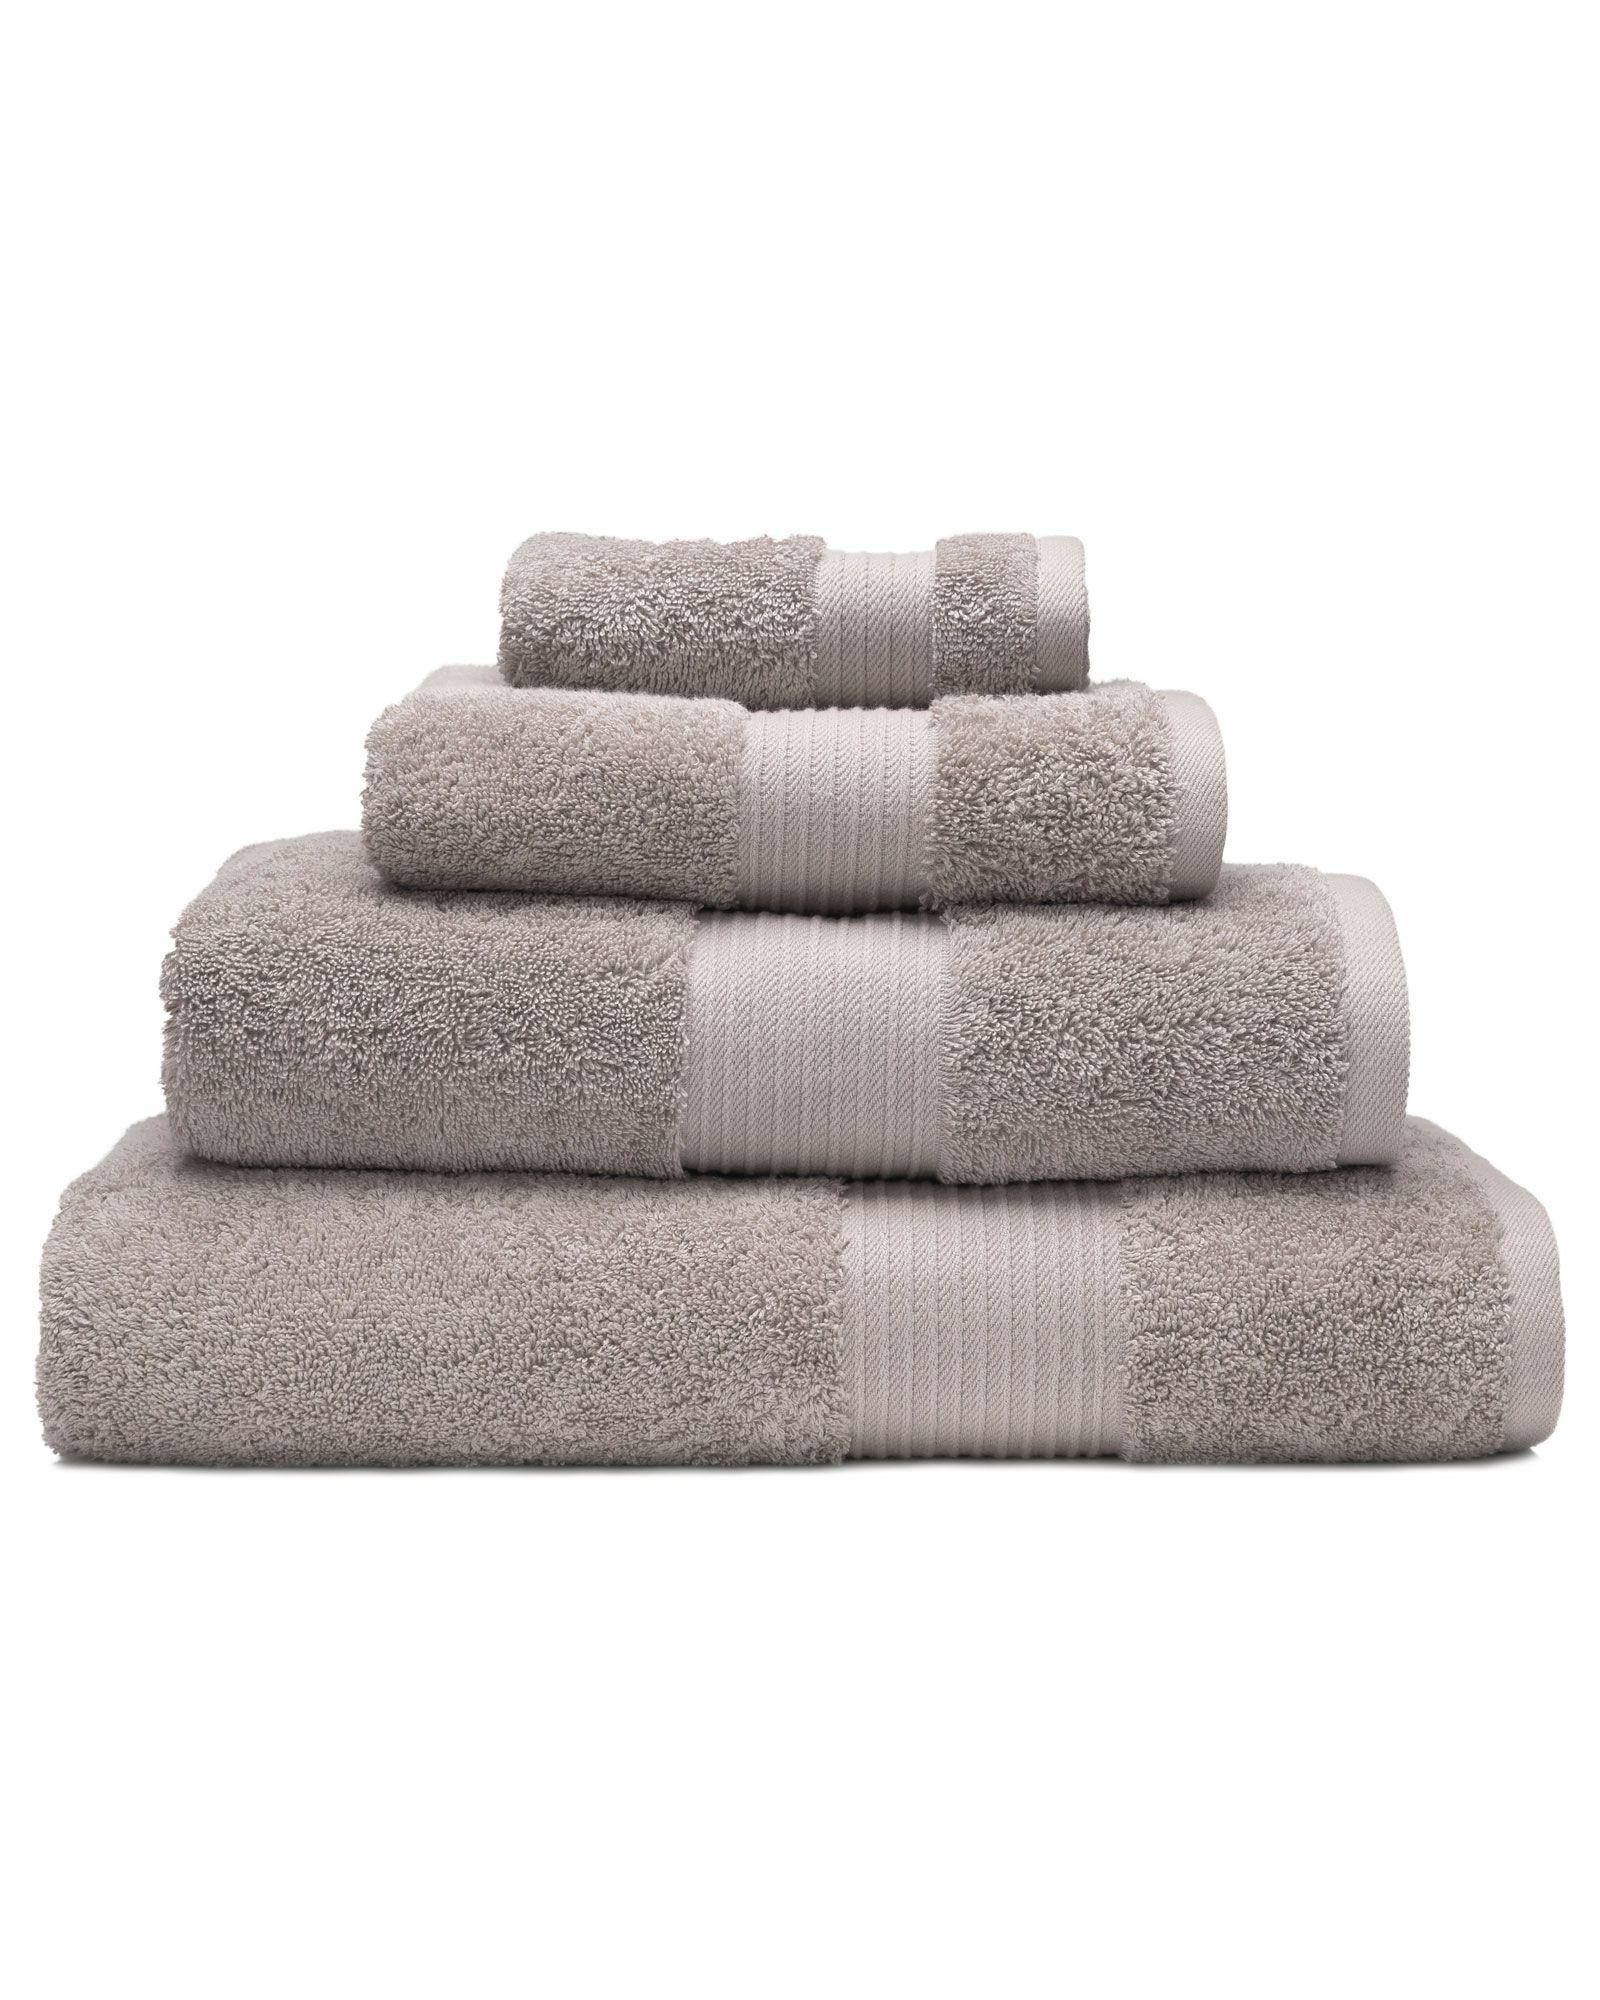 Pima 650g Face Cloth 2 Pack Towel Set Grey Bath Towels Turkish Cotton Towels